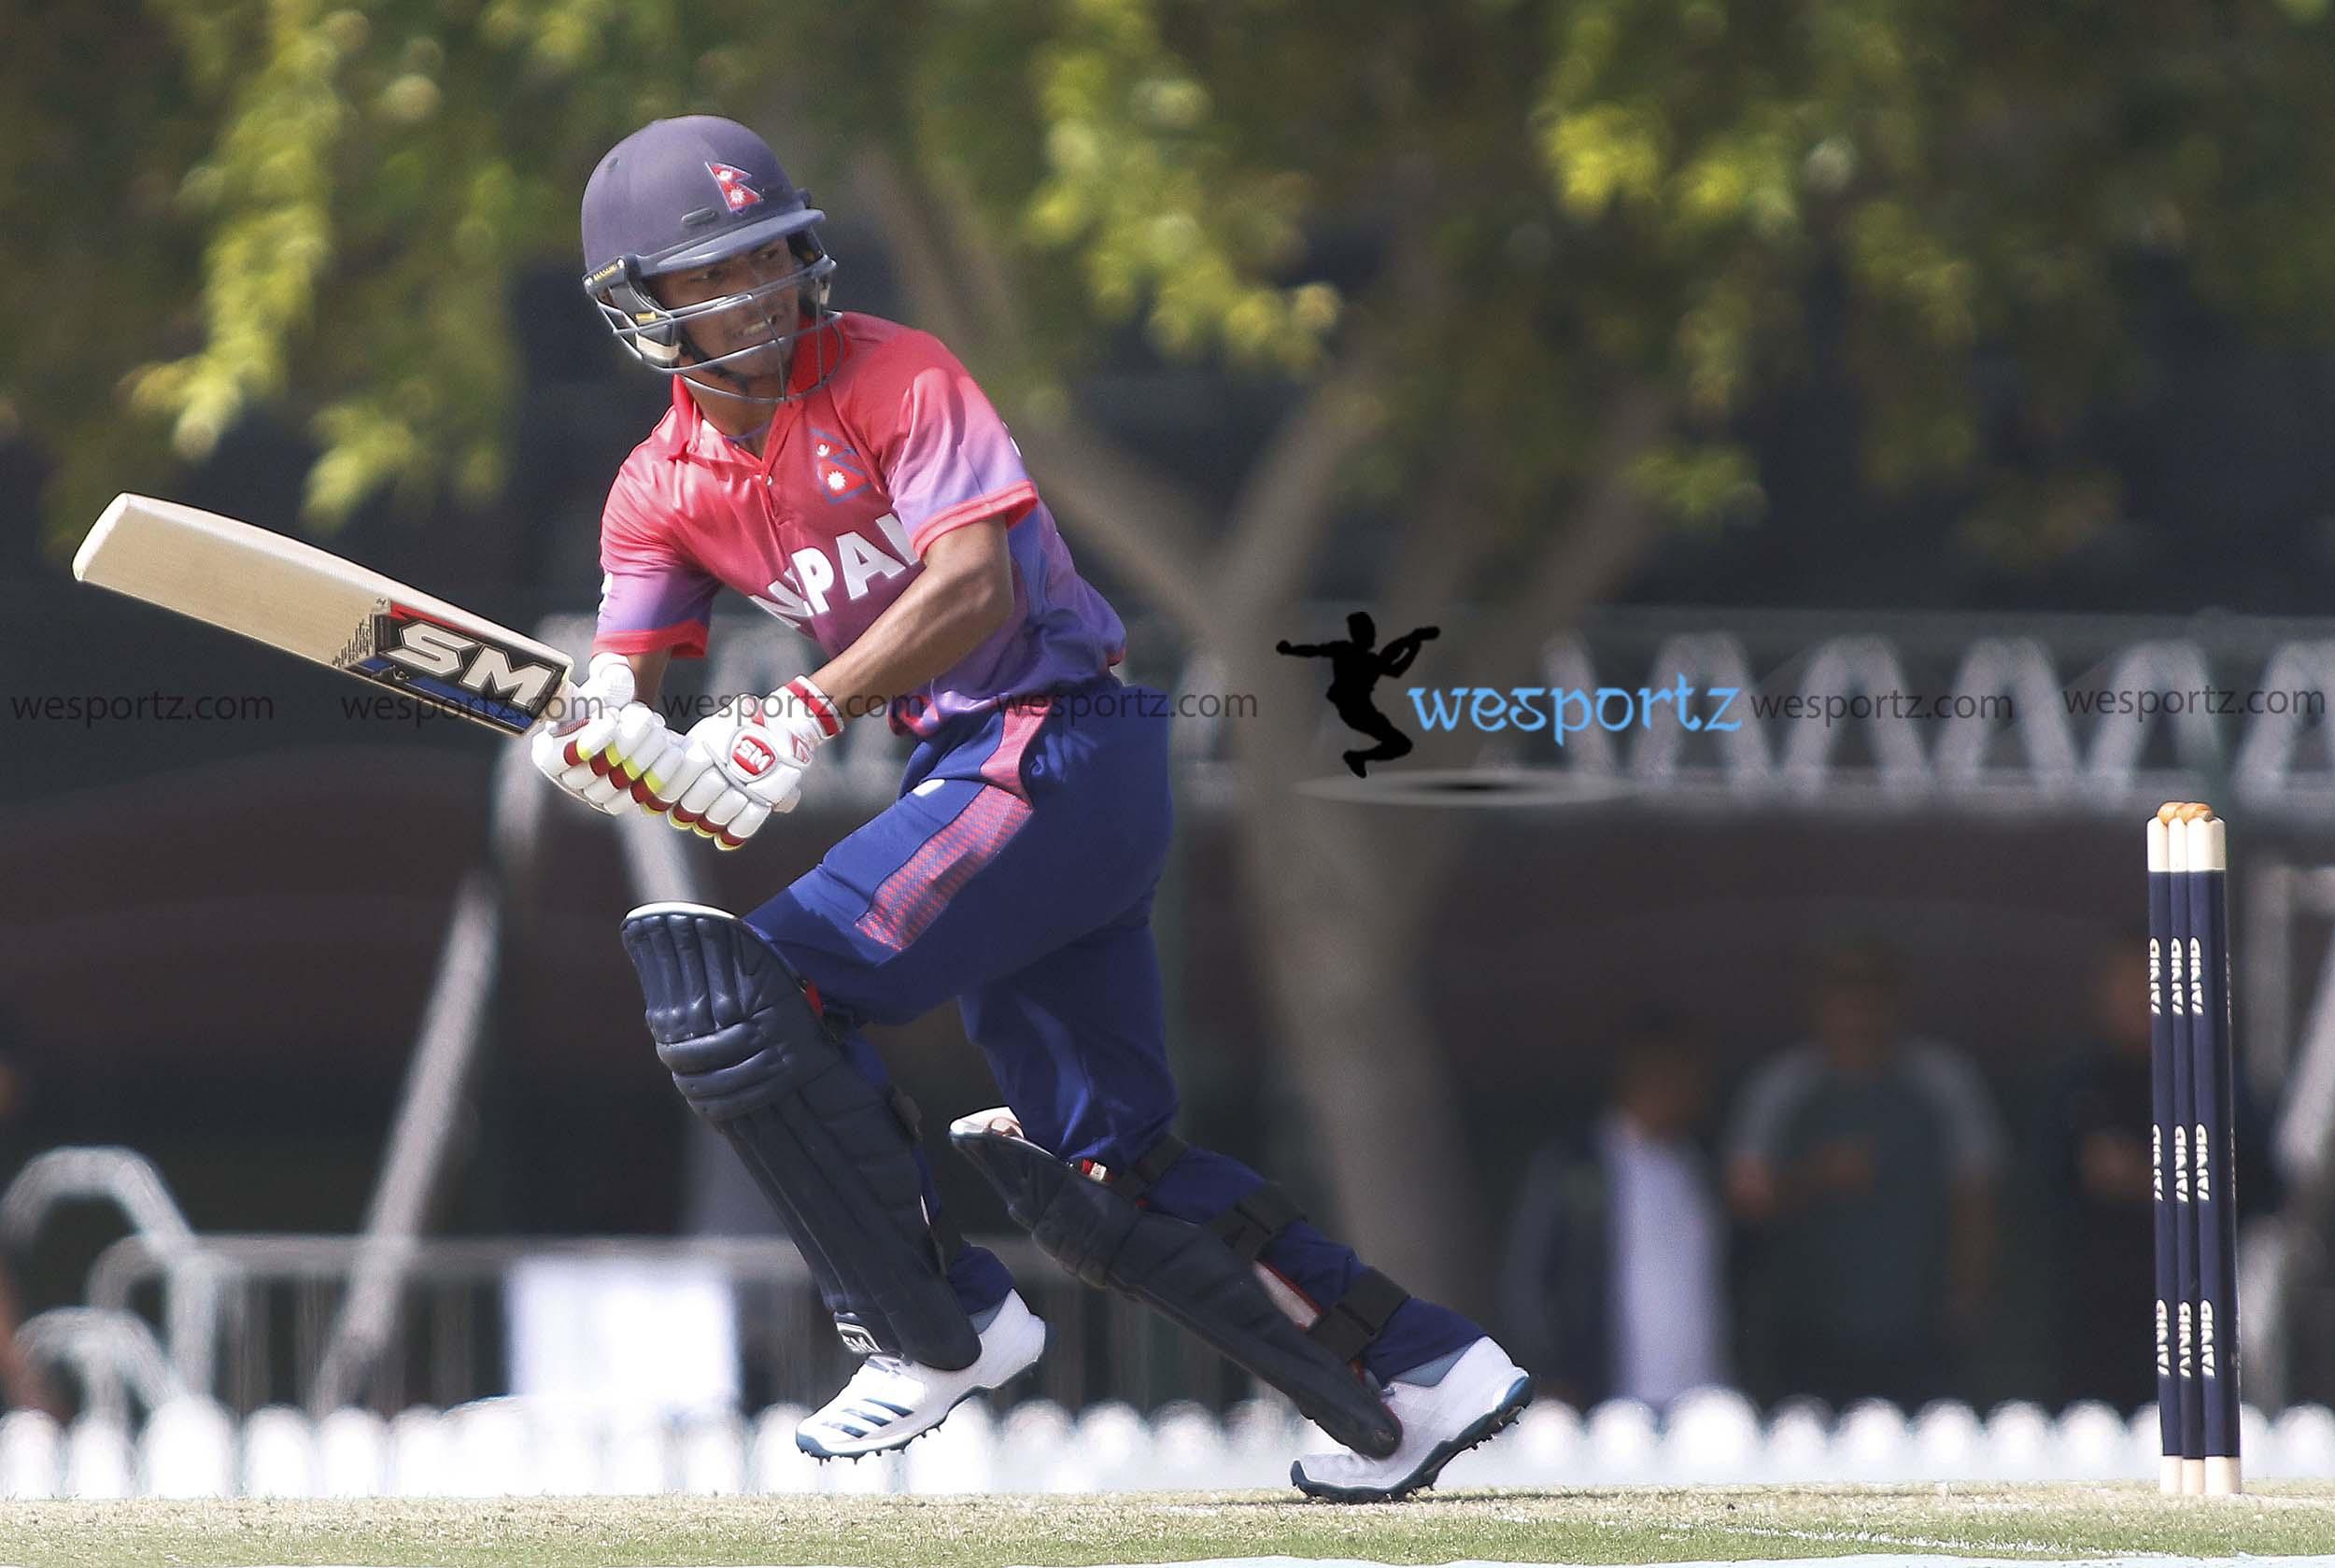 Rohit Kumar Paudel batting, Rohit in action